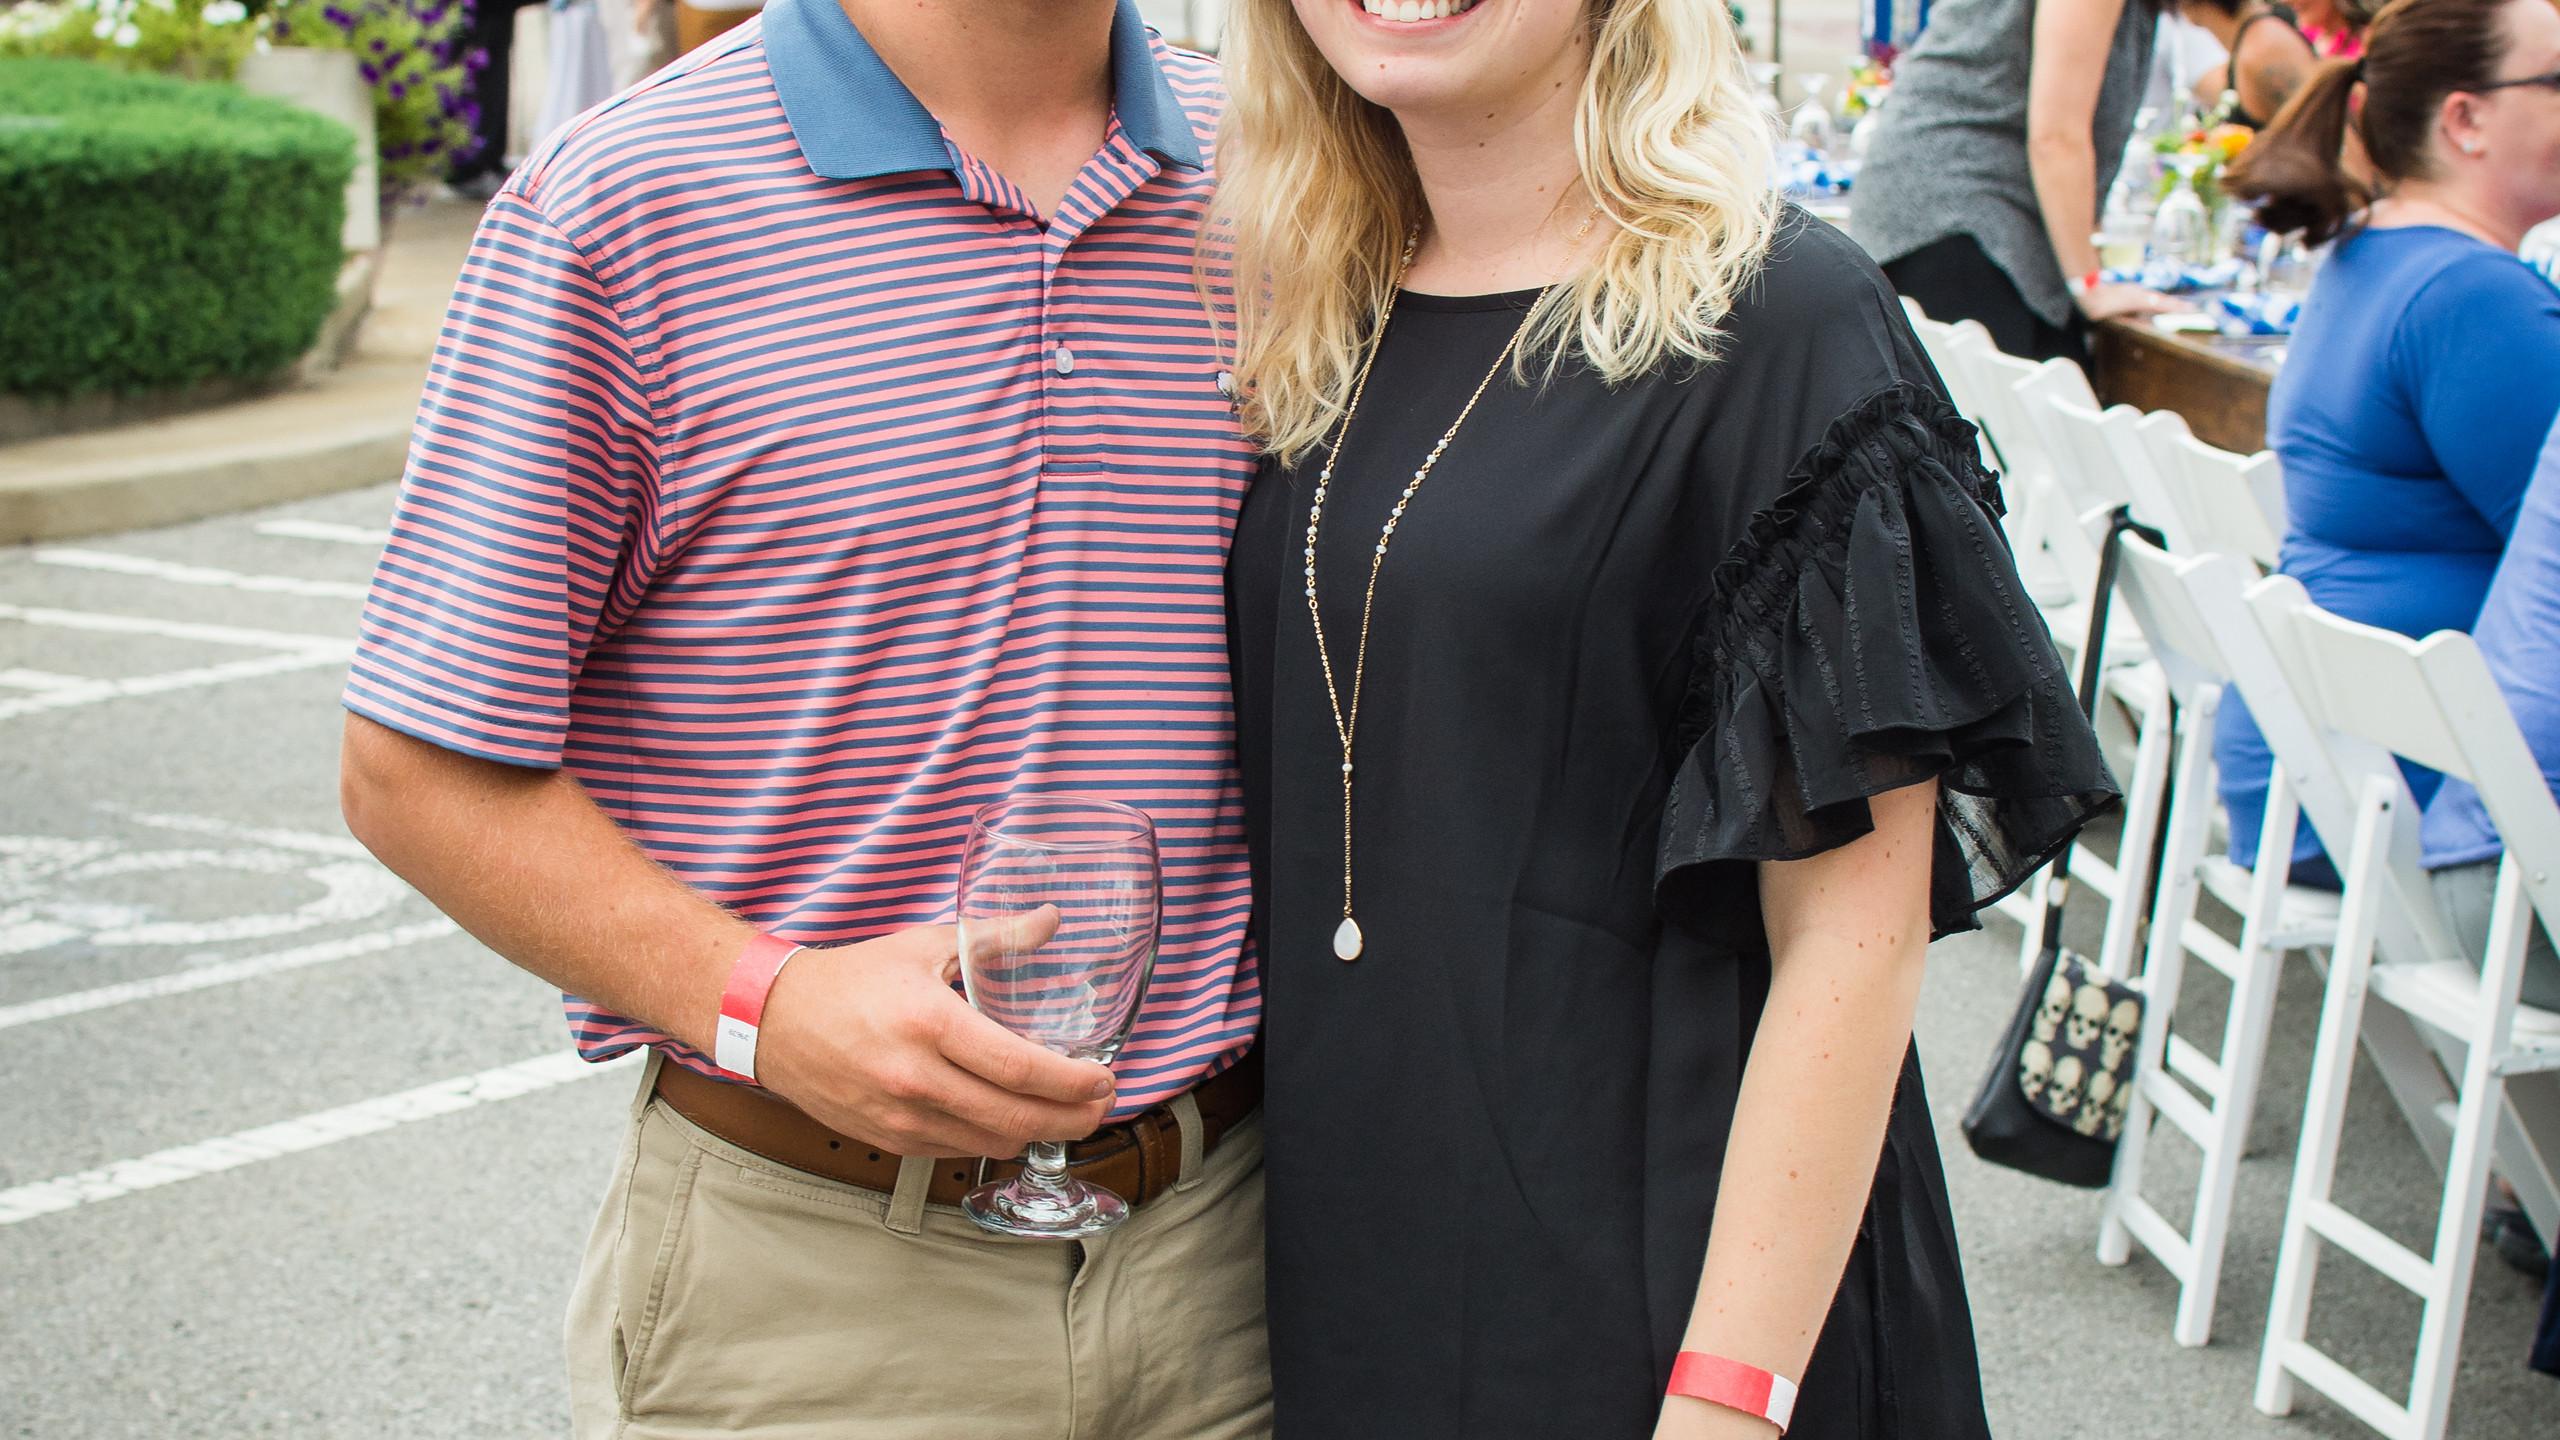 Luke and Megan Baggett